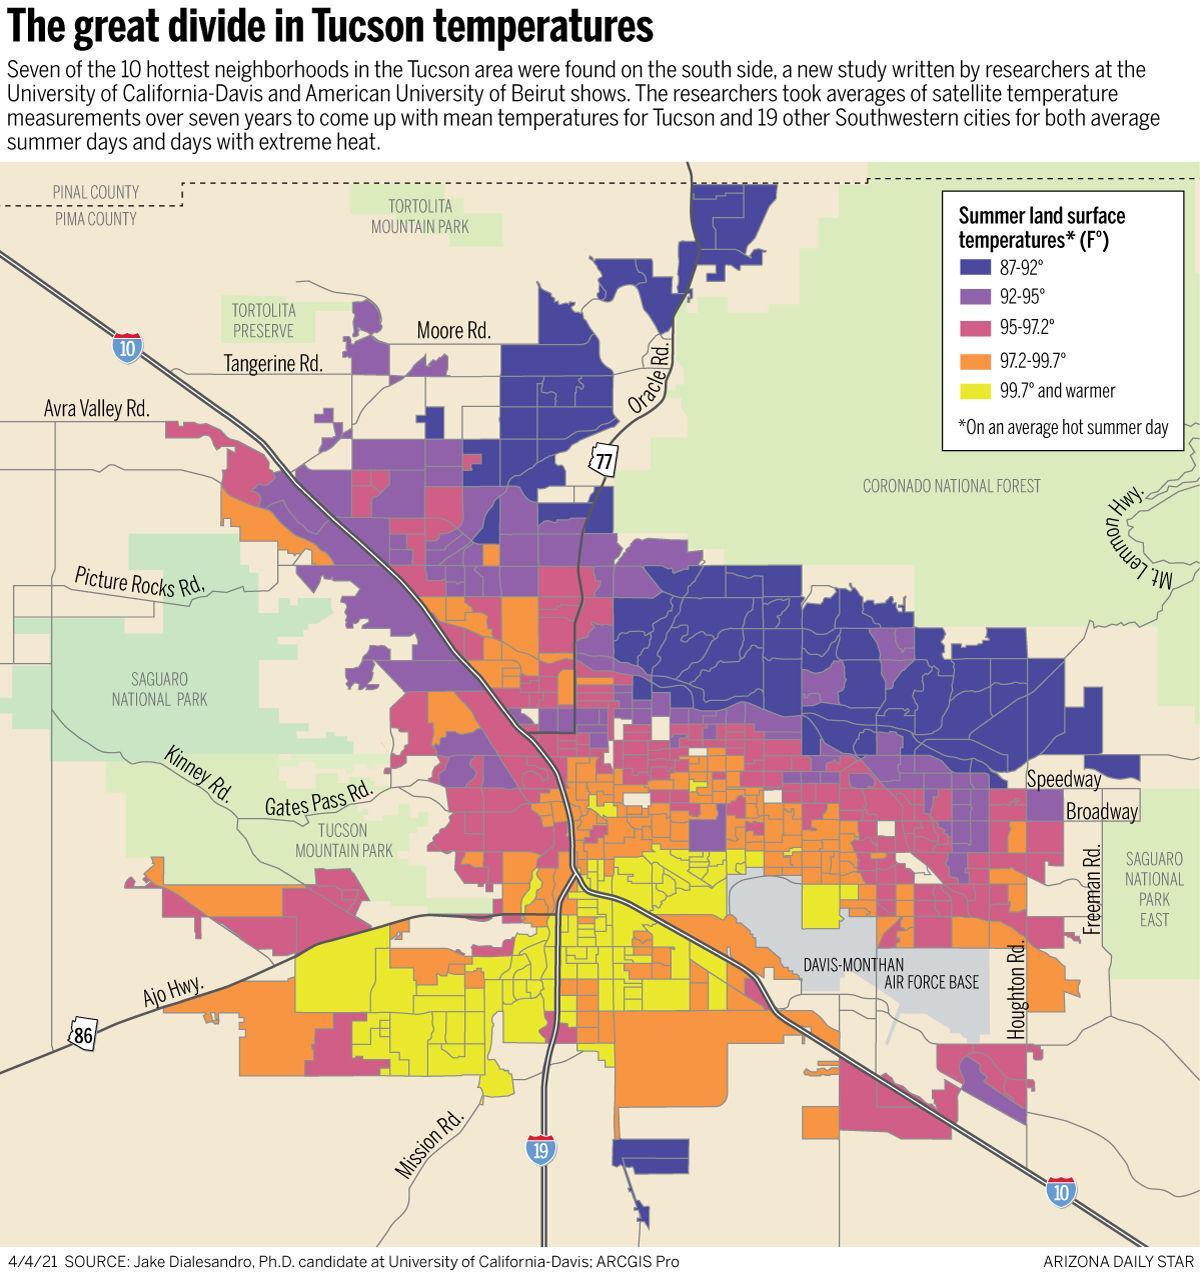 040421-metro-heat-inequality-g1